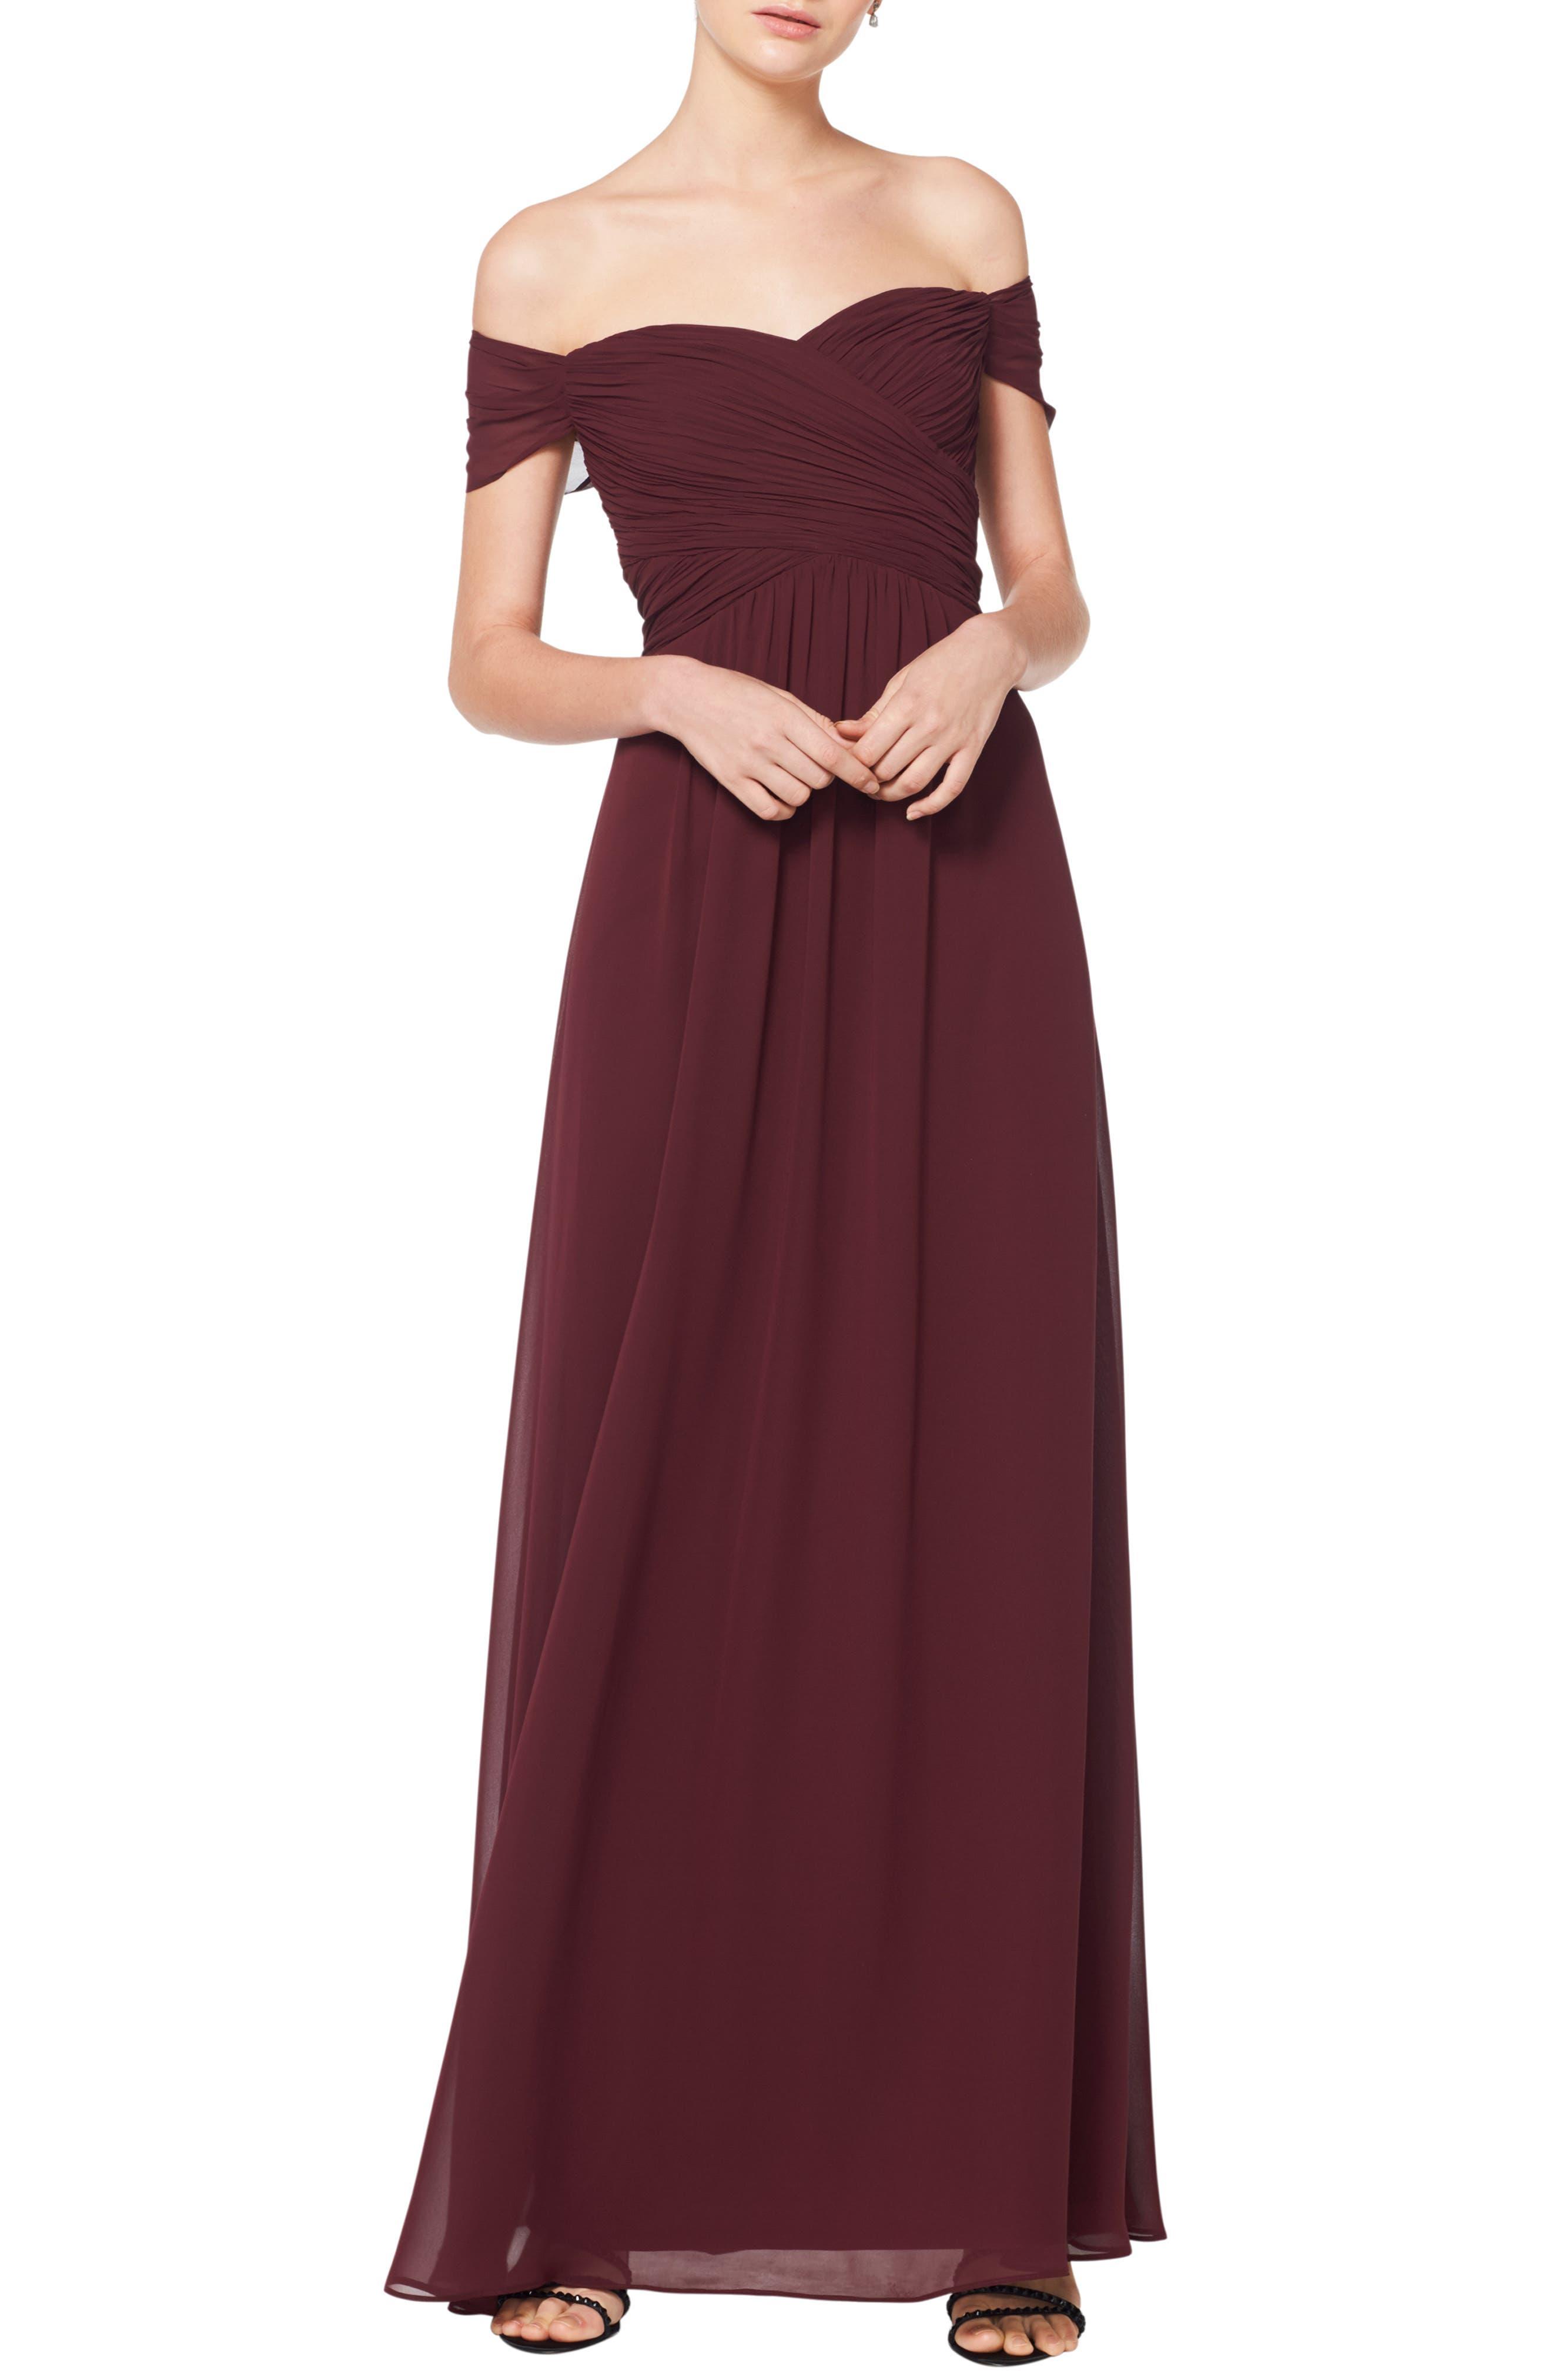 #levkoff Off The Shoulder Ruched Bodice Chiffon Evening Dress, Burgundy